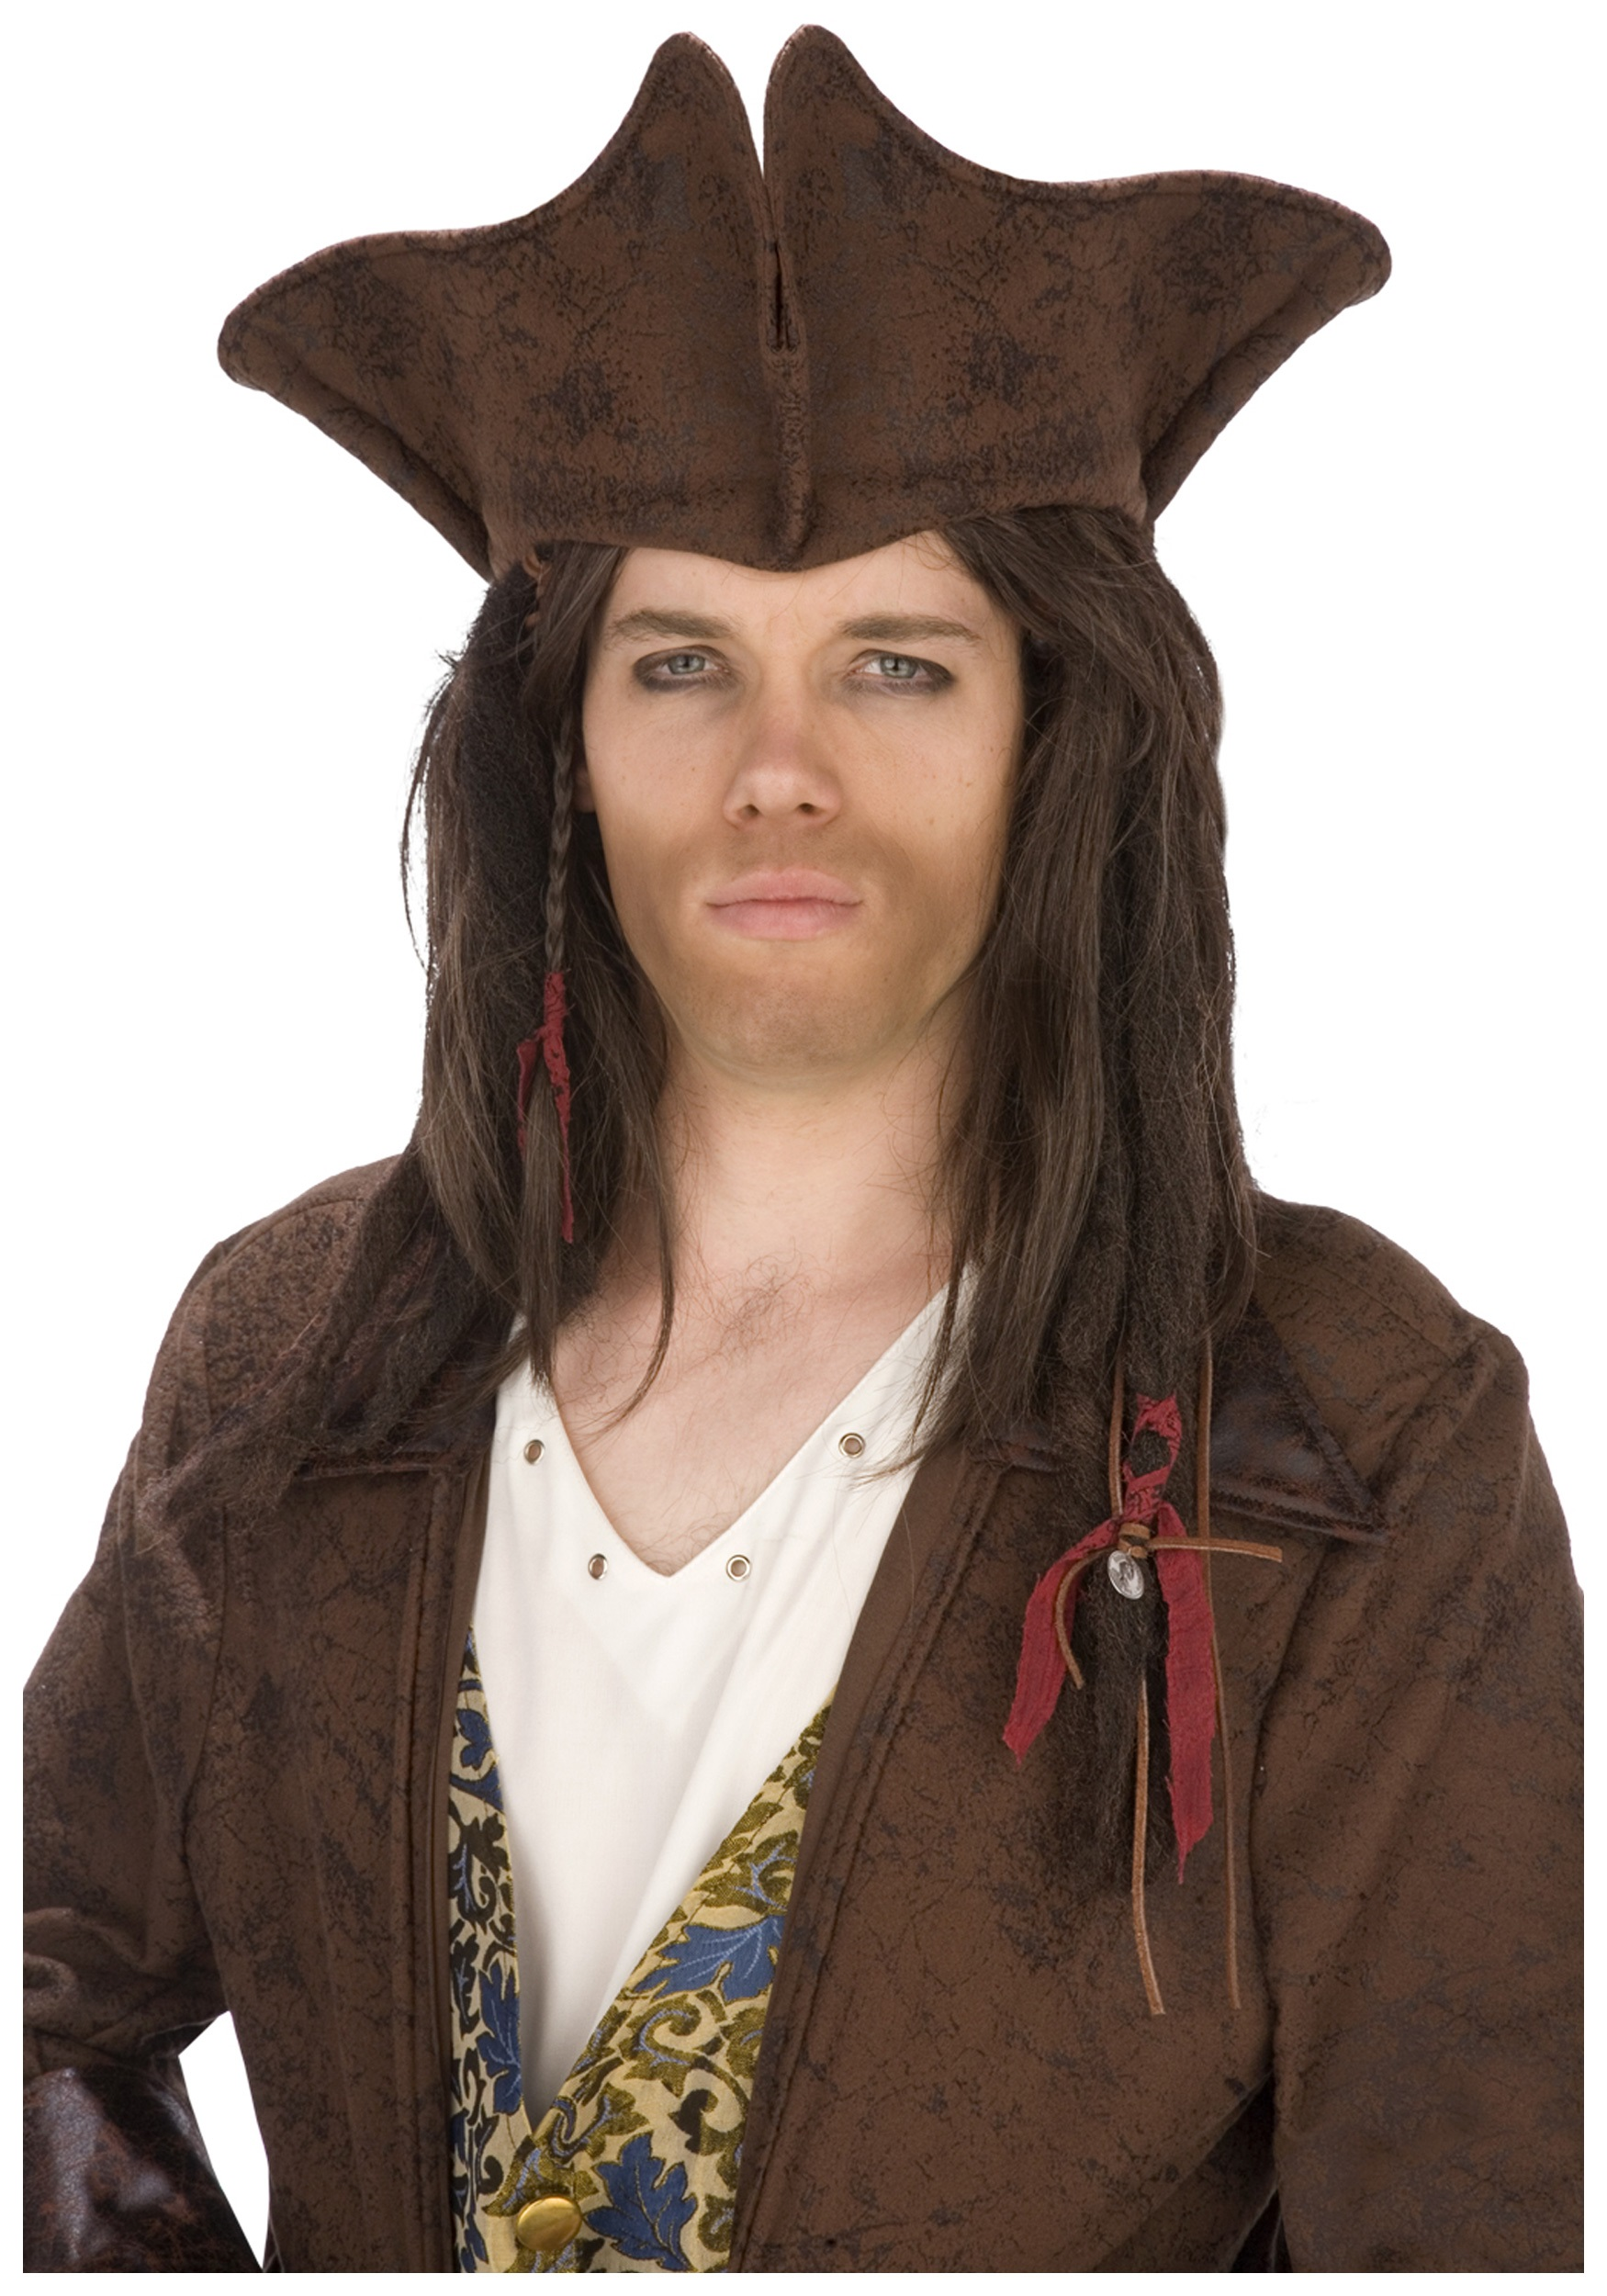 Dark Brown Pirate Hat  sc 1 st  Halloween Costumes & Dark Brown Pirate Hat - Halloween Costumes